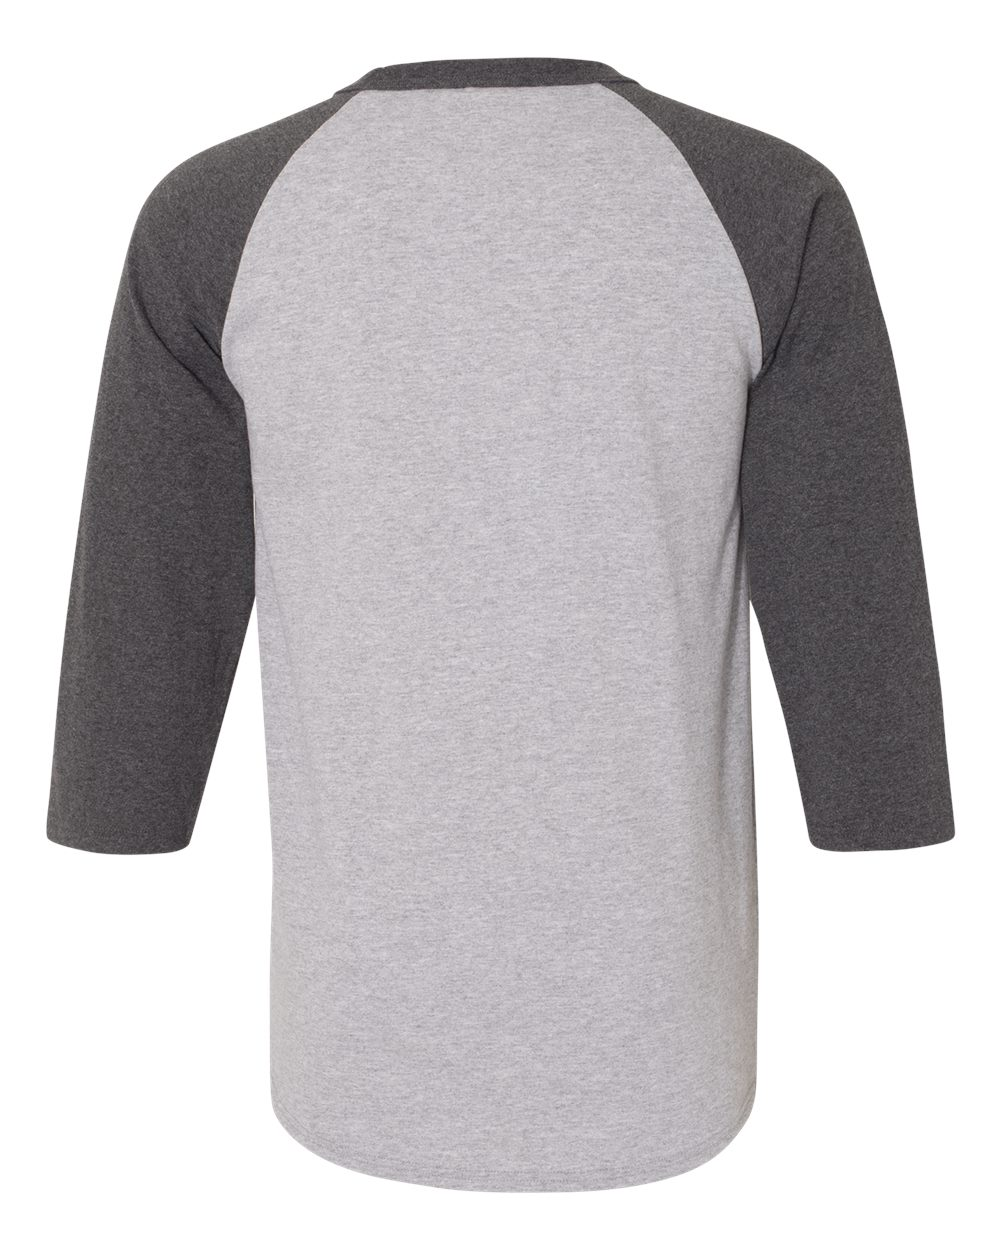 ce95b0c0 Champion Men's 5.2 oz. Raglan Baseball T-Shirt T1397 S-3XL | eBay